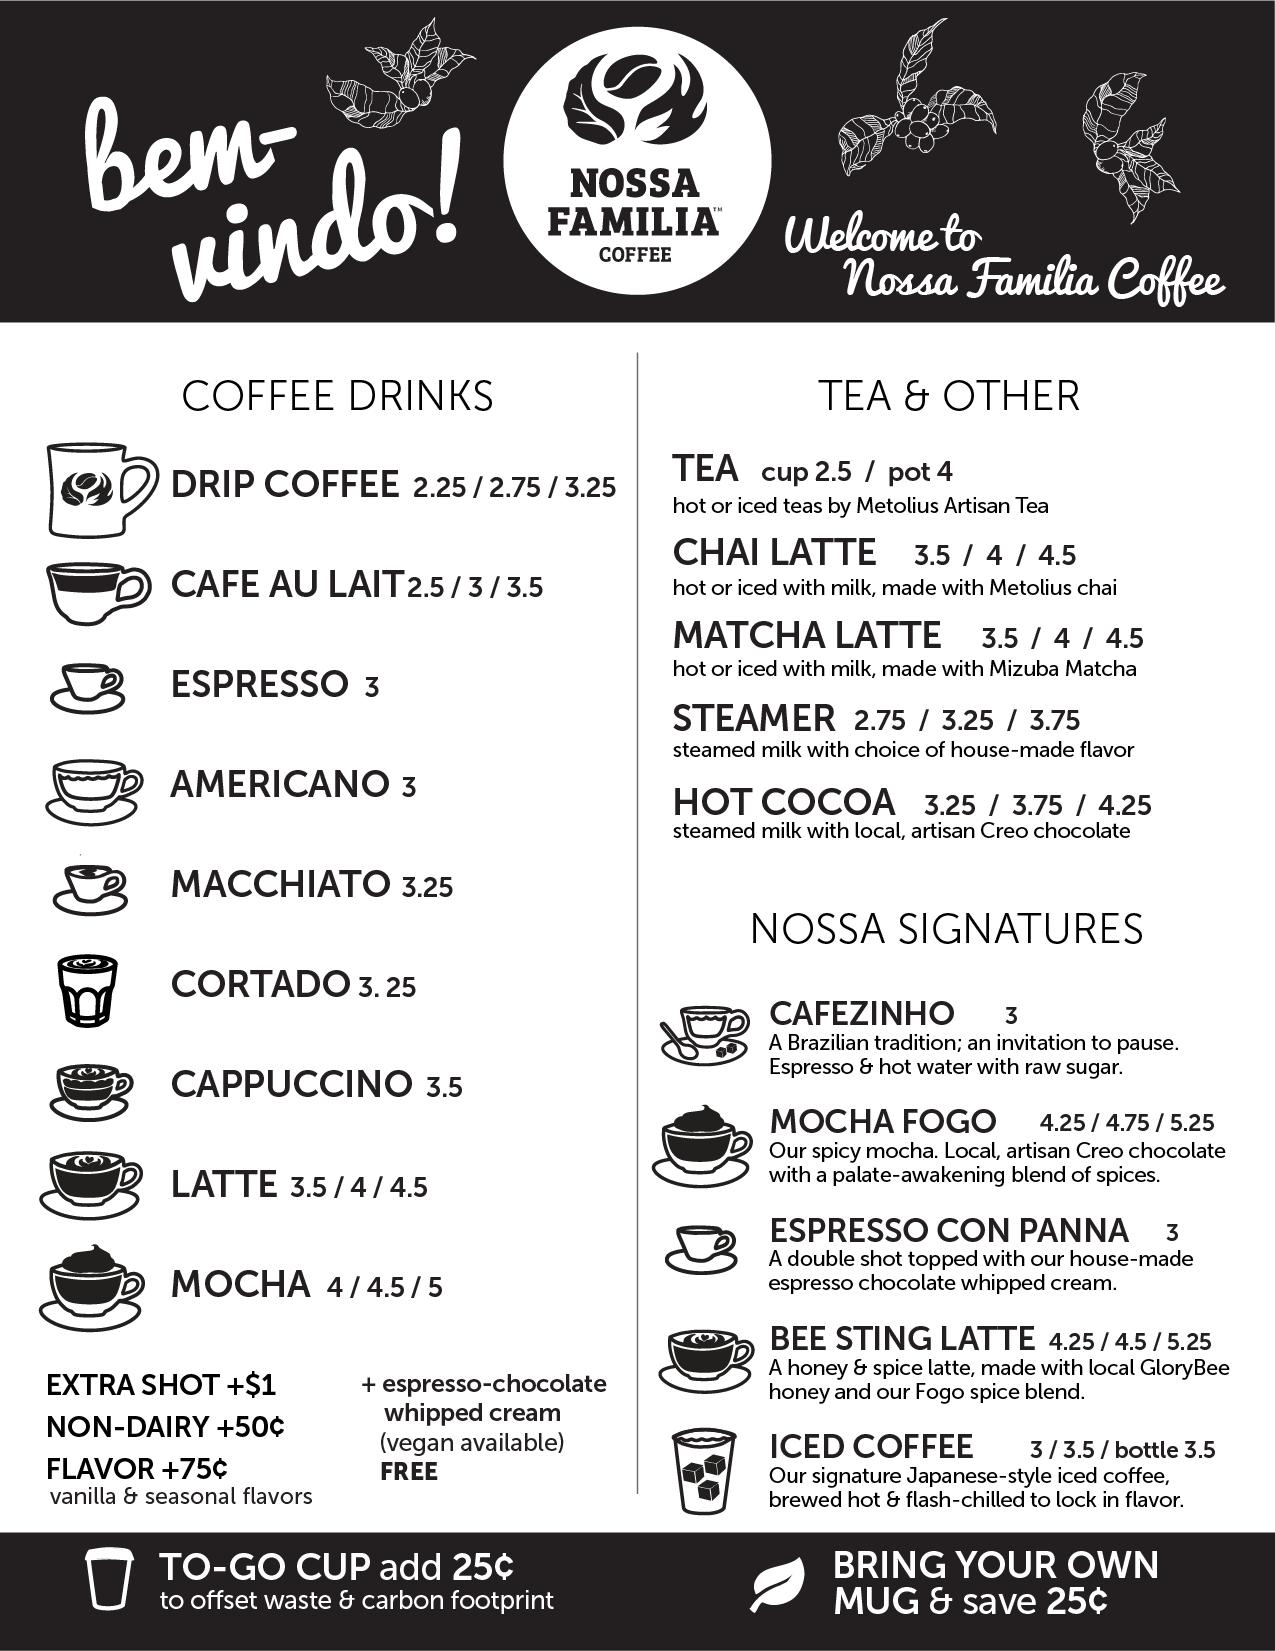 Nossa Familia Coffee - Seven Corners Café Coffee & Other Drinks Menu